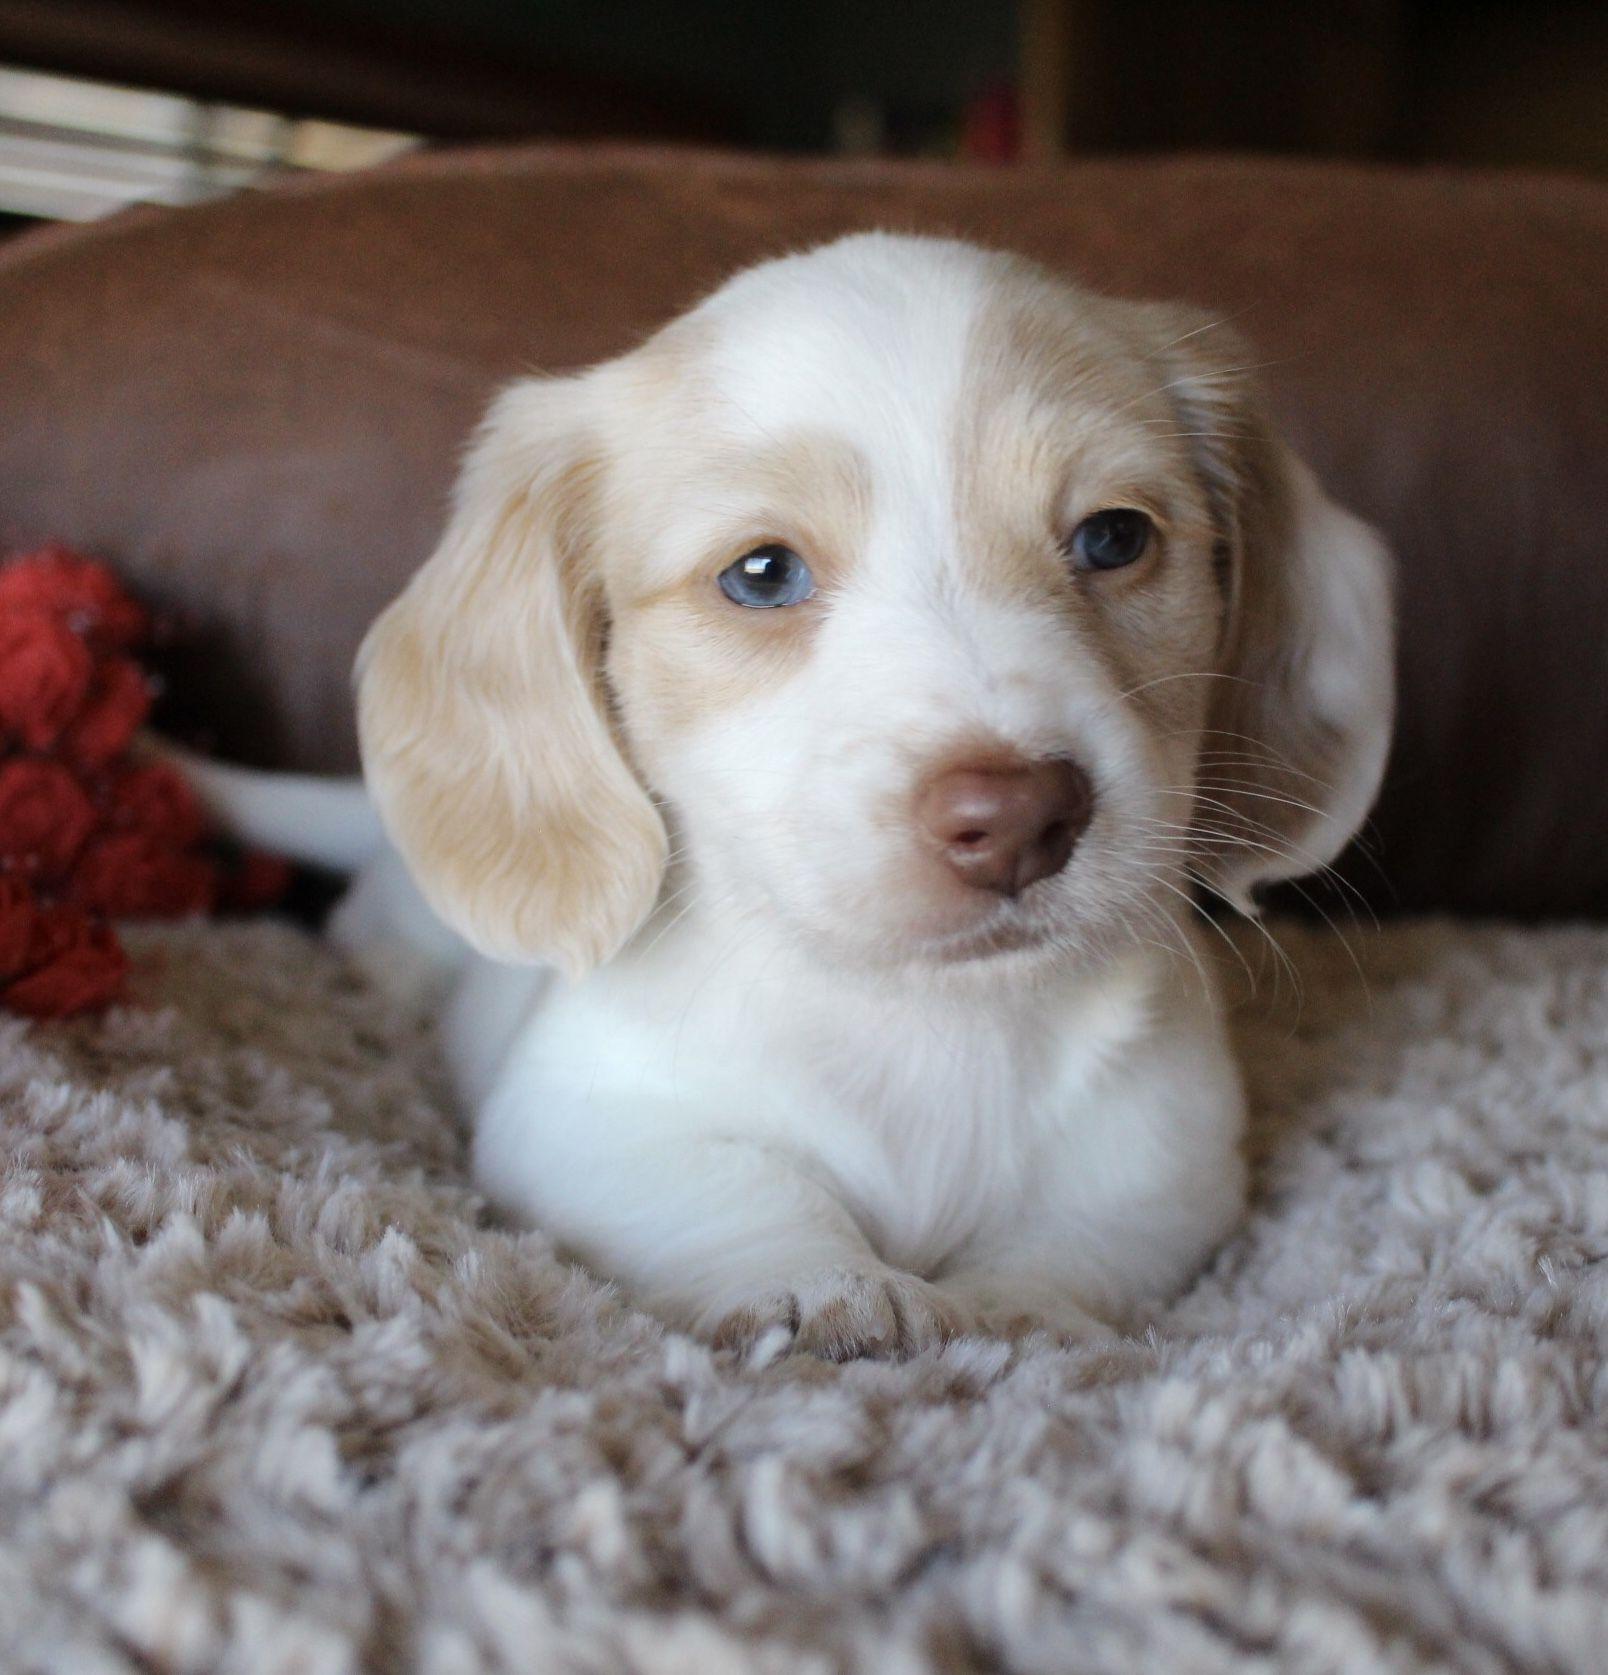 Cream Piebald Miniature Dachshund Longhair Puppy At Muddy River